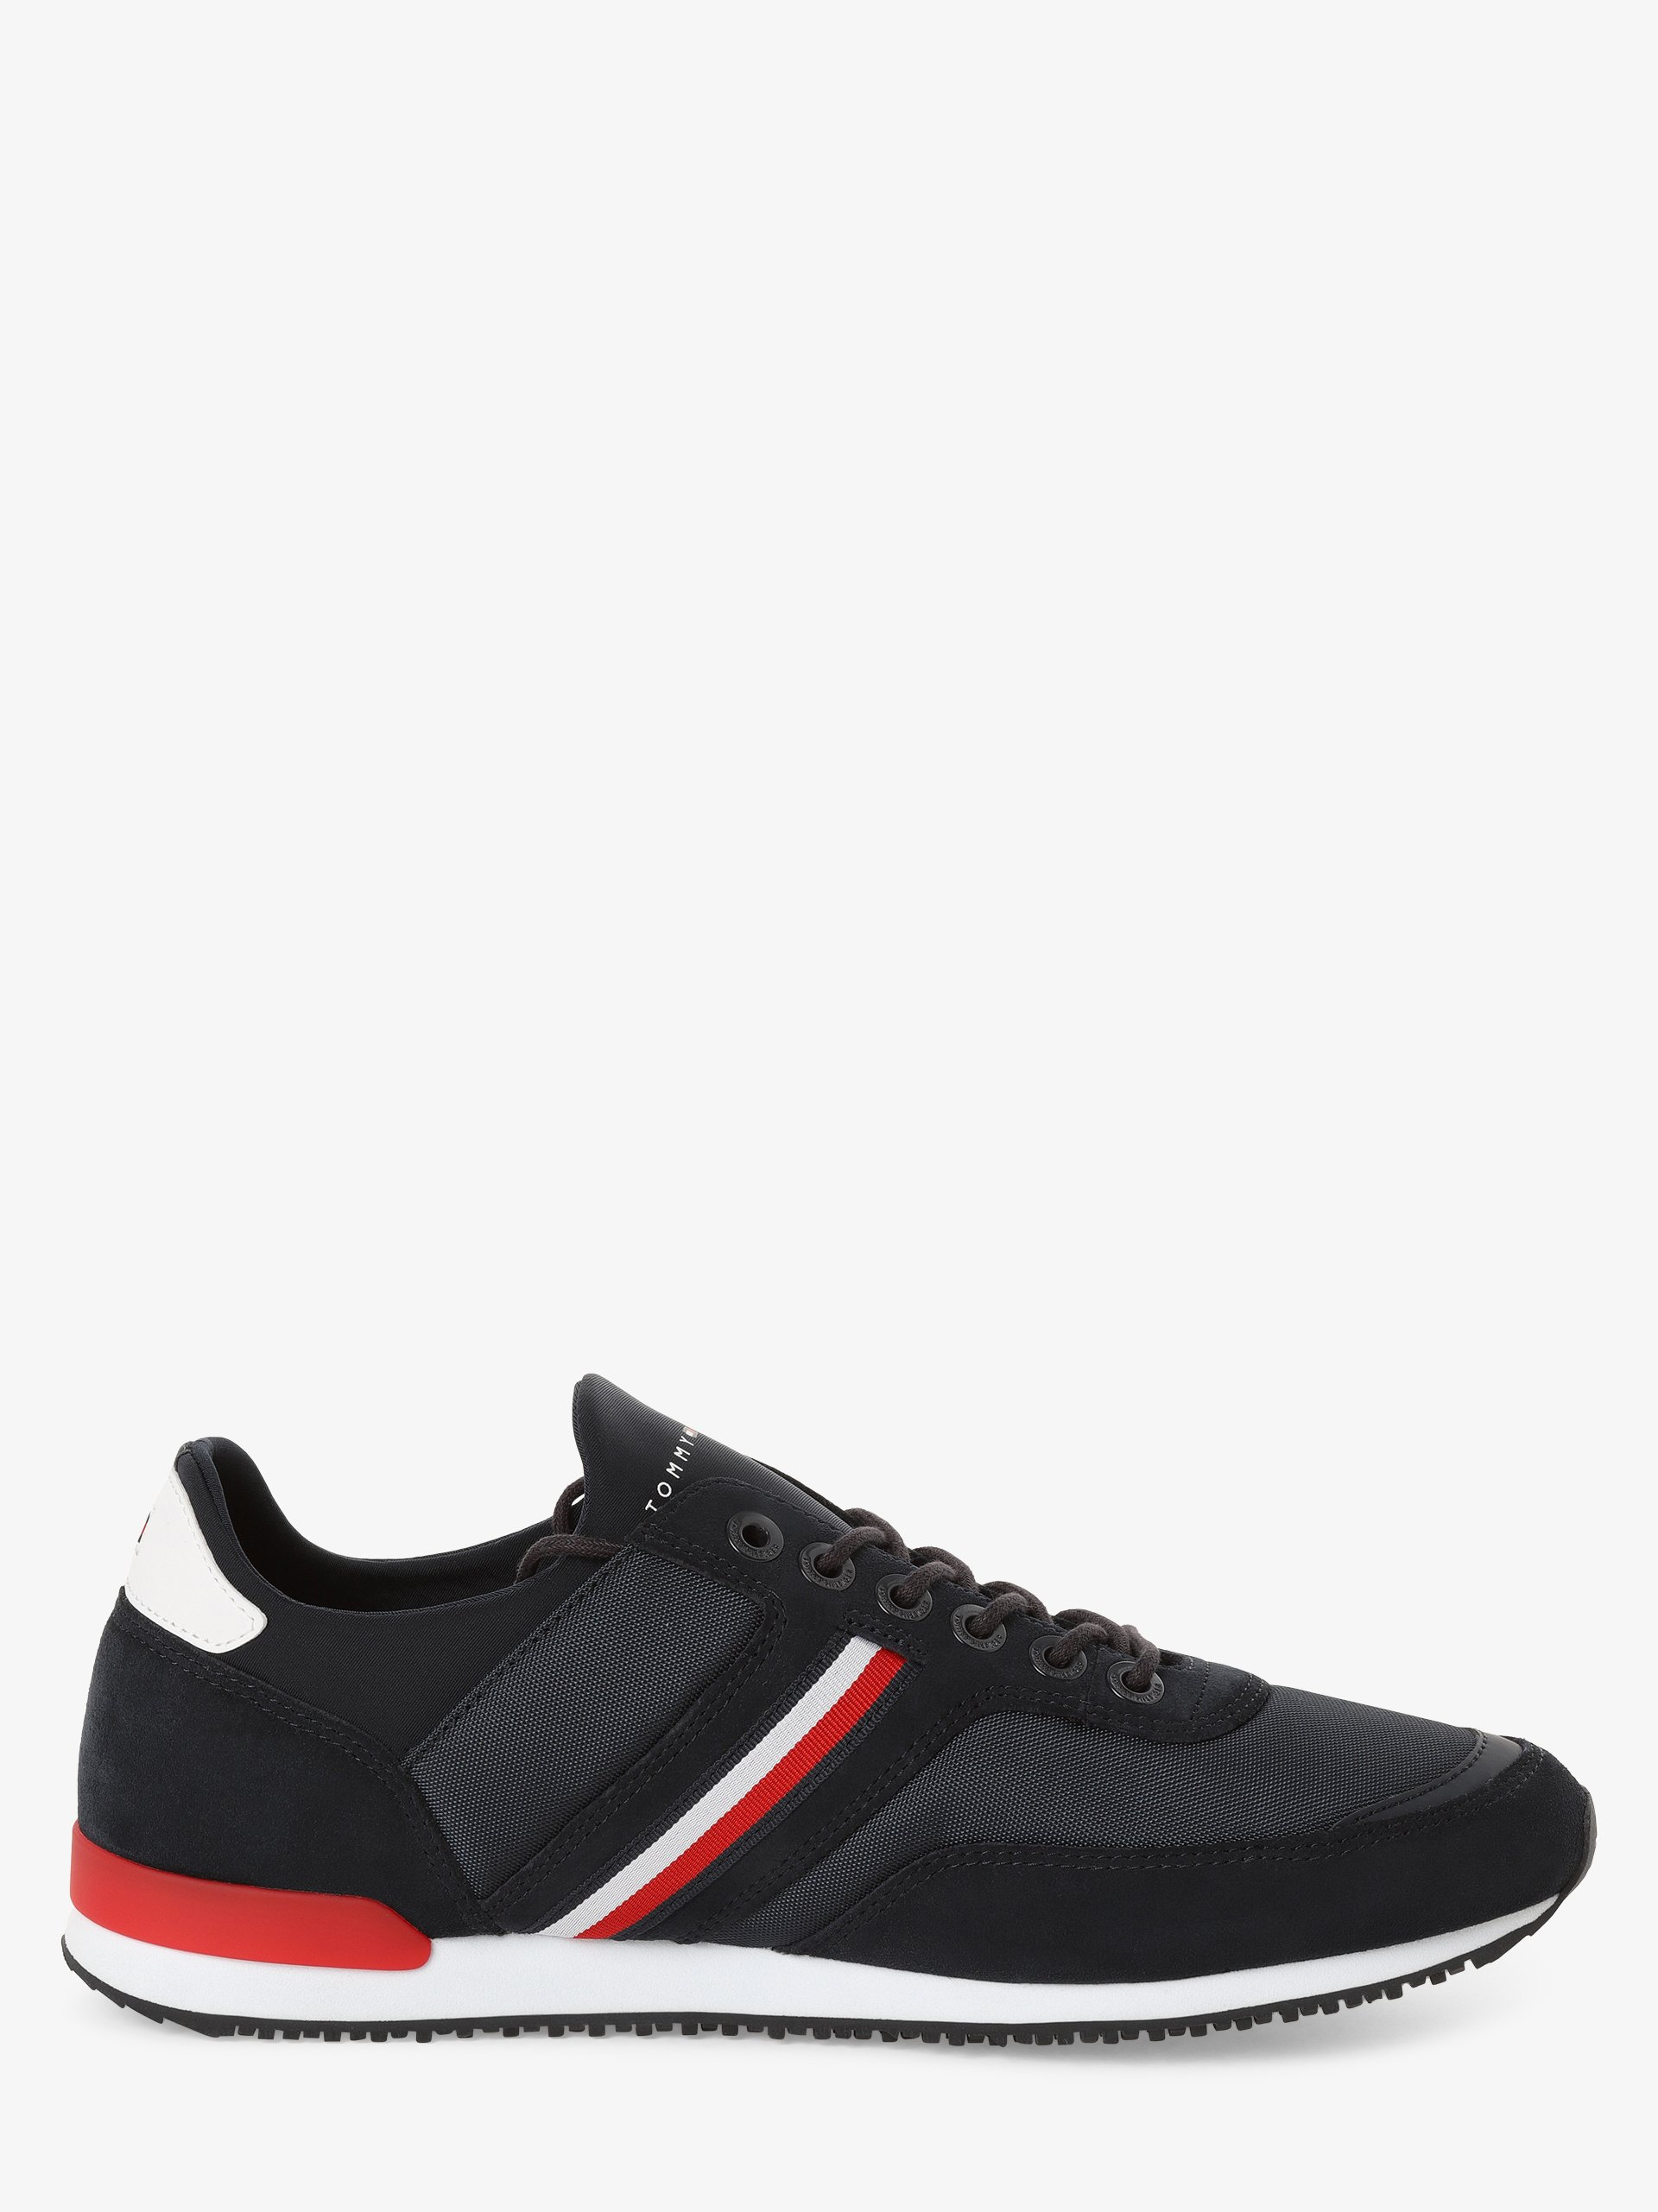 Tommy Hilfiger Tenisówki męskie z dodatkiem skóry – Iconic Sock Runner